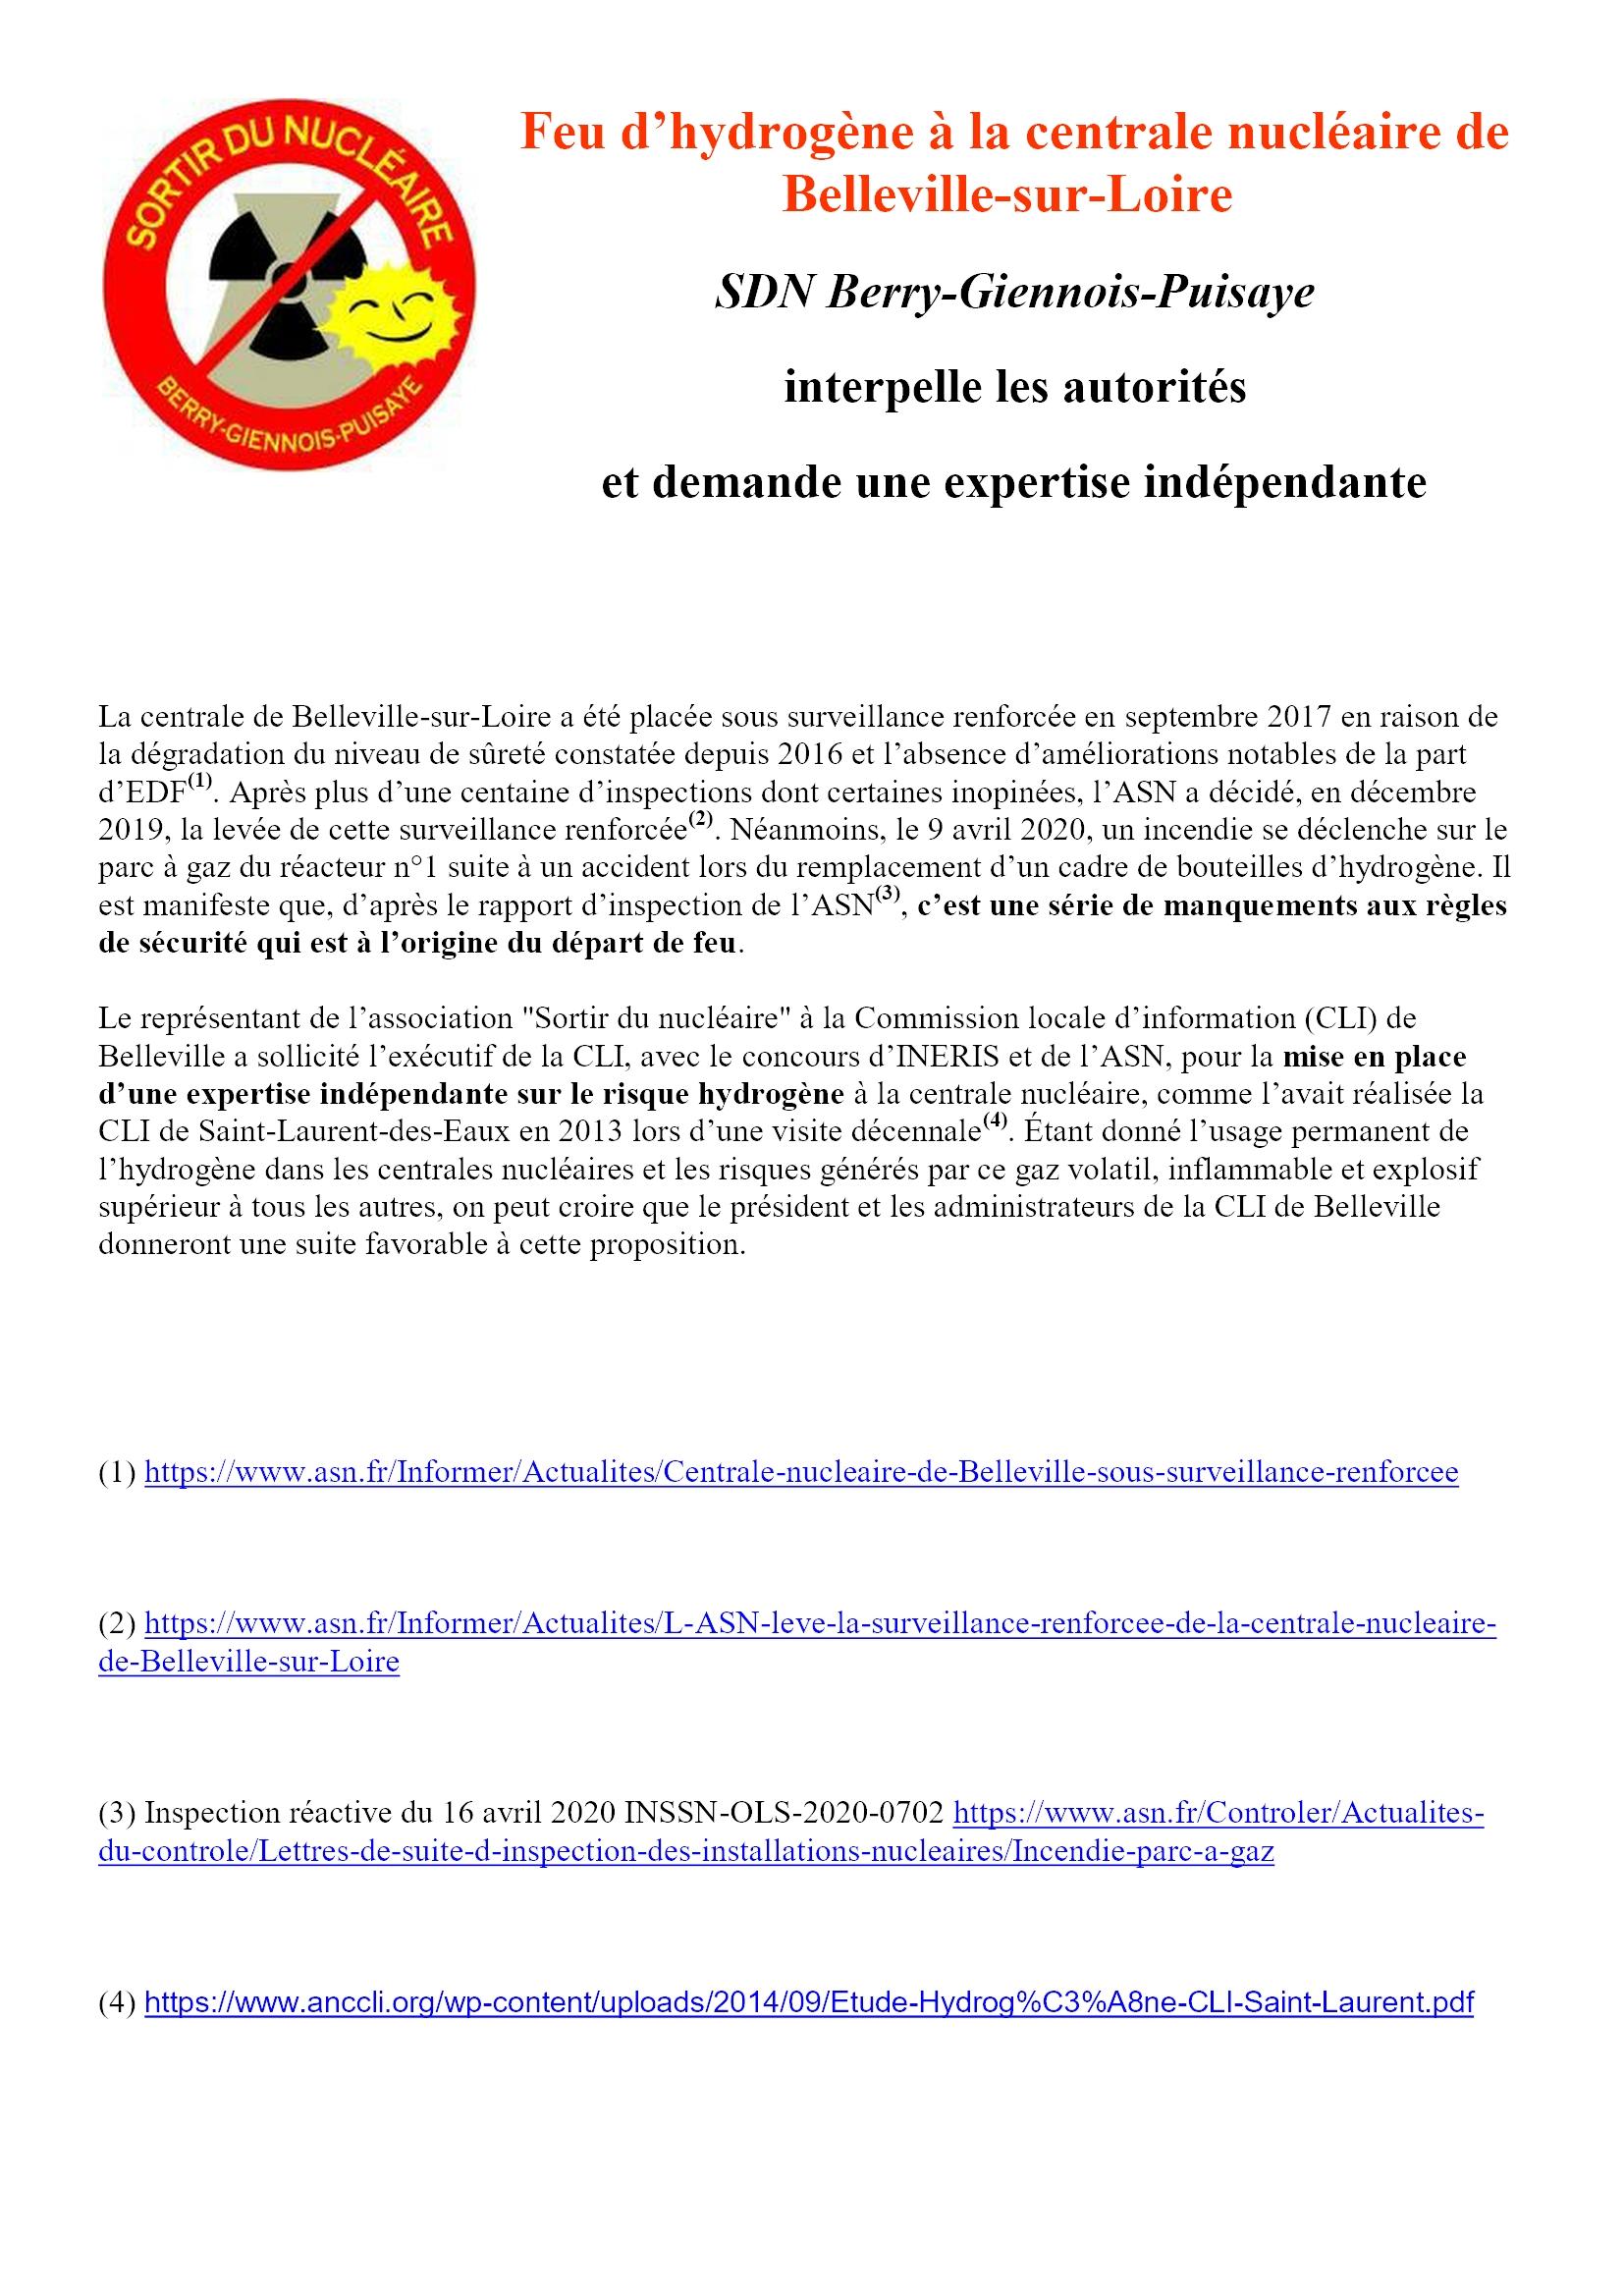 ComPress SDN Berry Giennois Puisaye Feu d'hydrogène à Belleville 10-04-2020